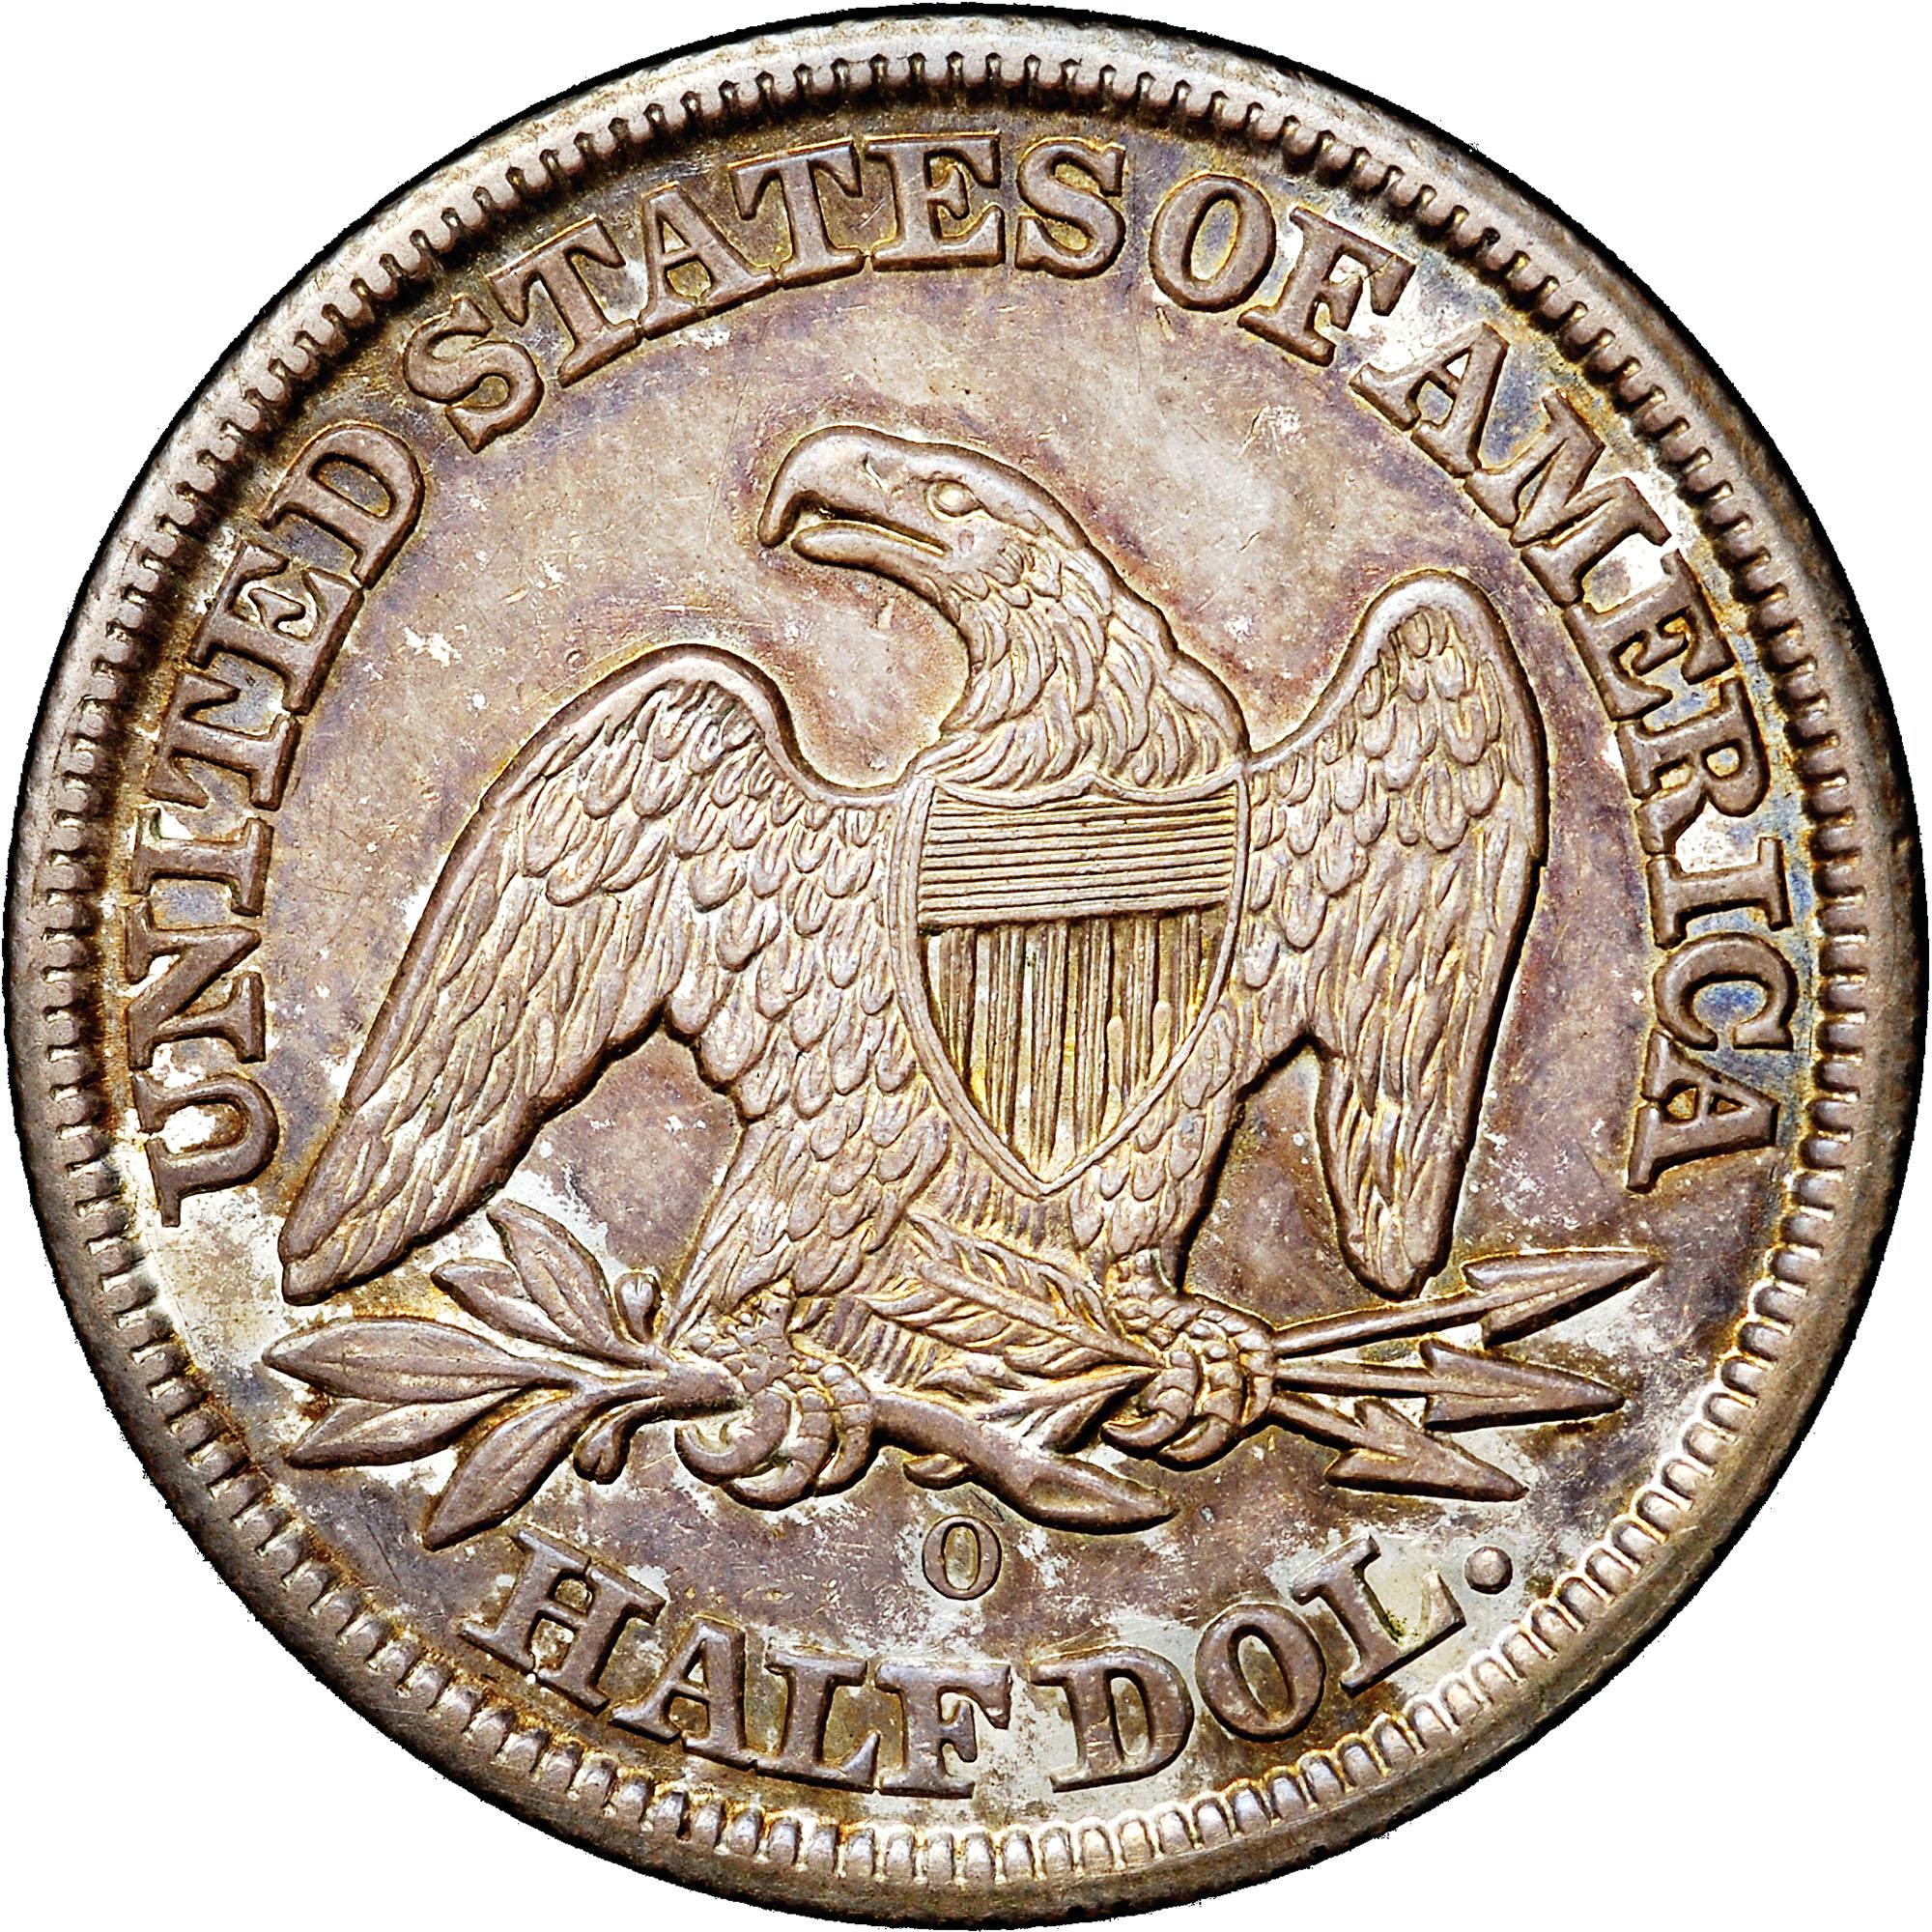 1855 half dollar coin value